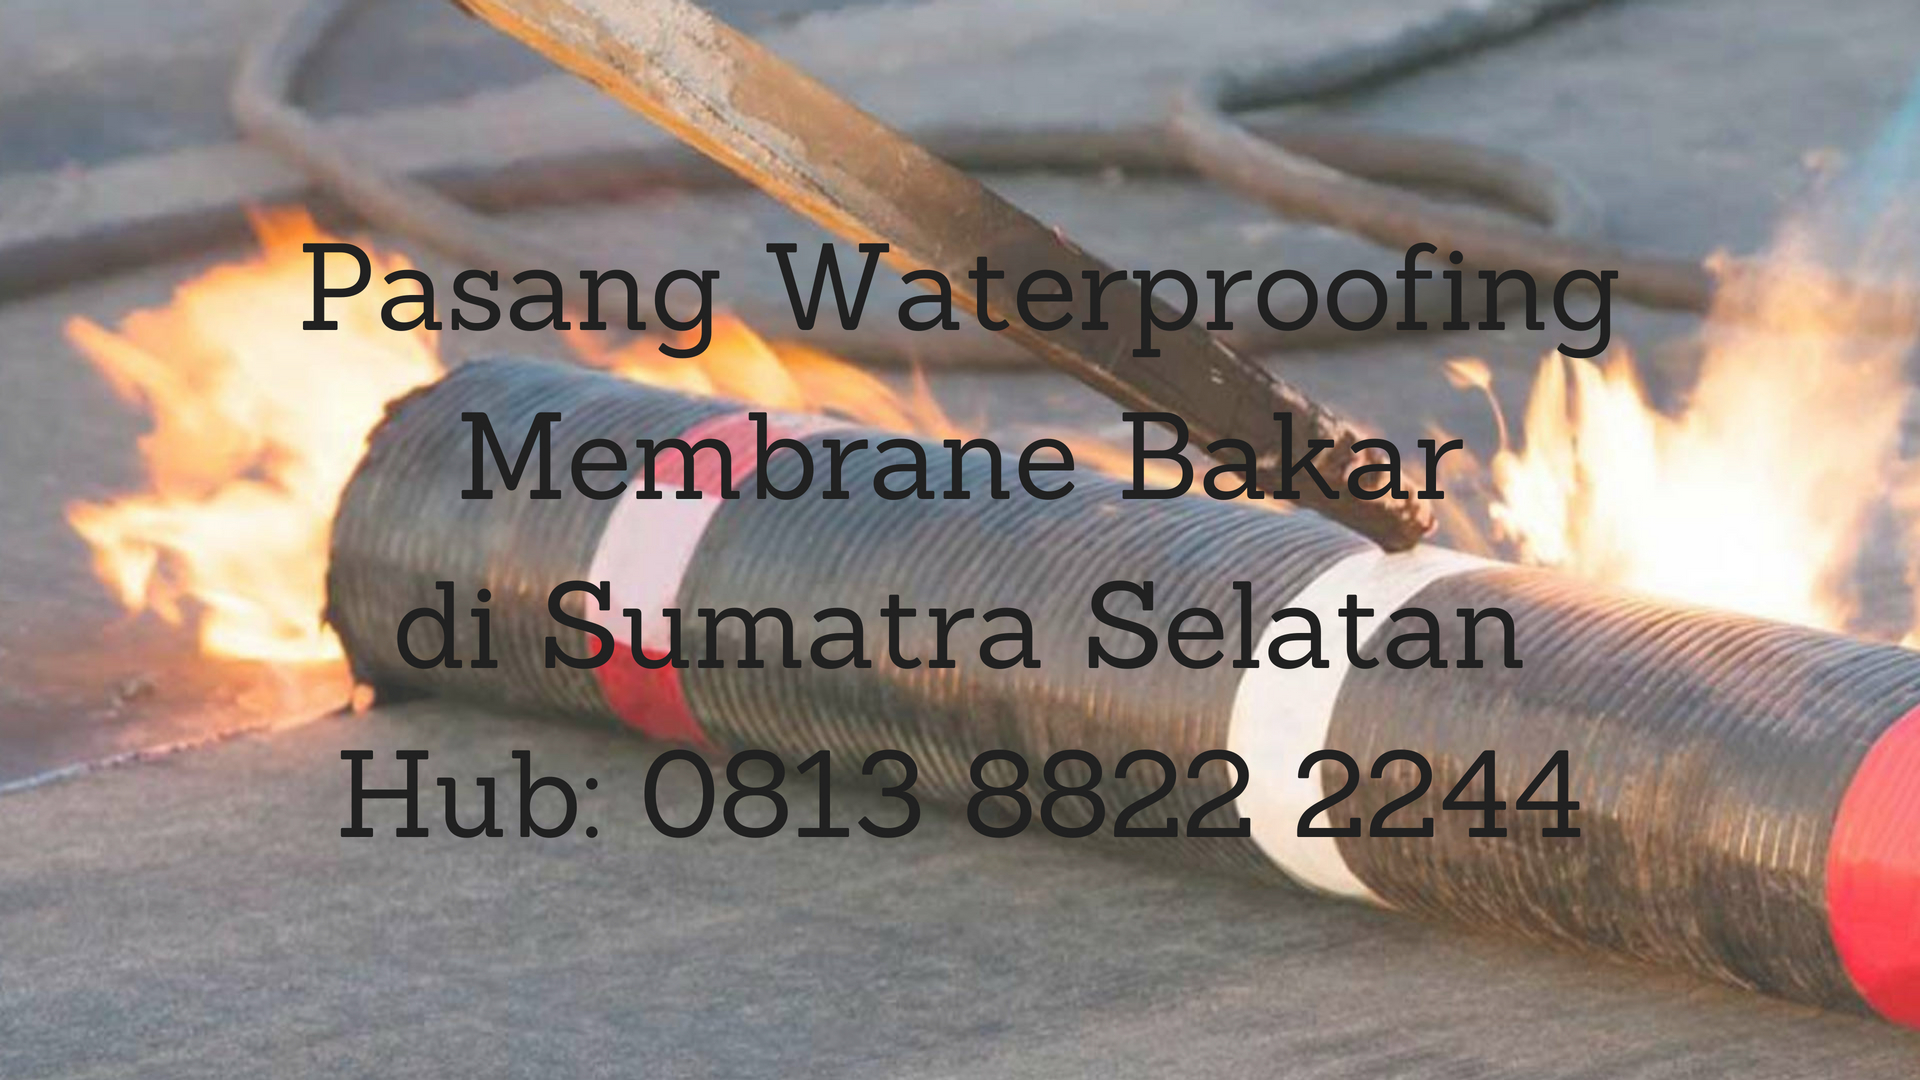 Pasang Waterproofing Membrane Bakar Di Sumatera Selatan Hub 0813 8822 2244